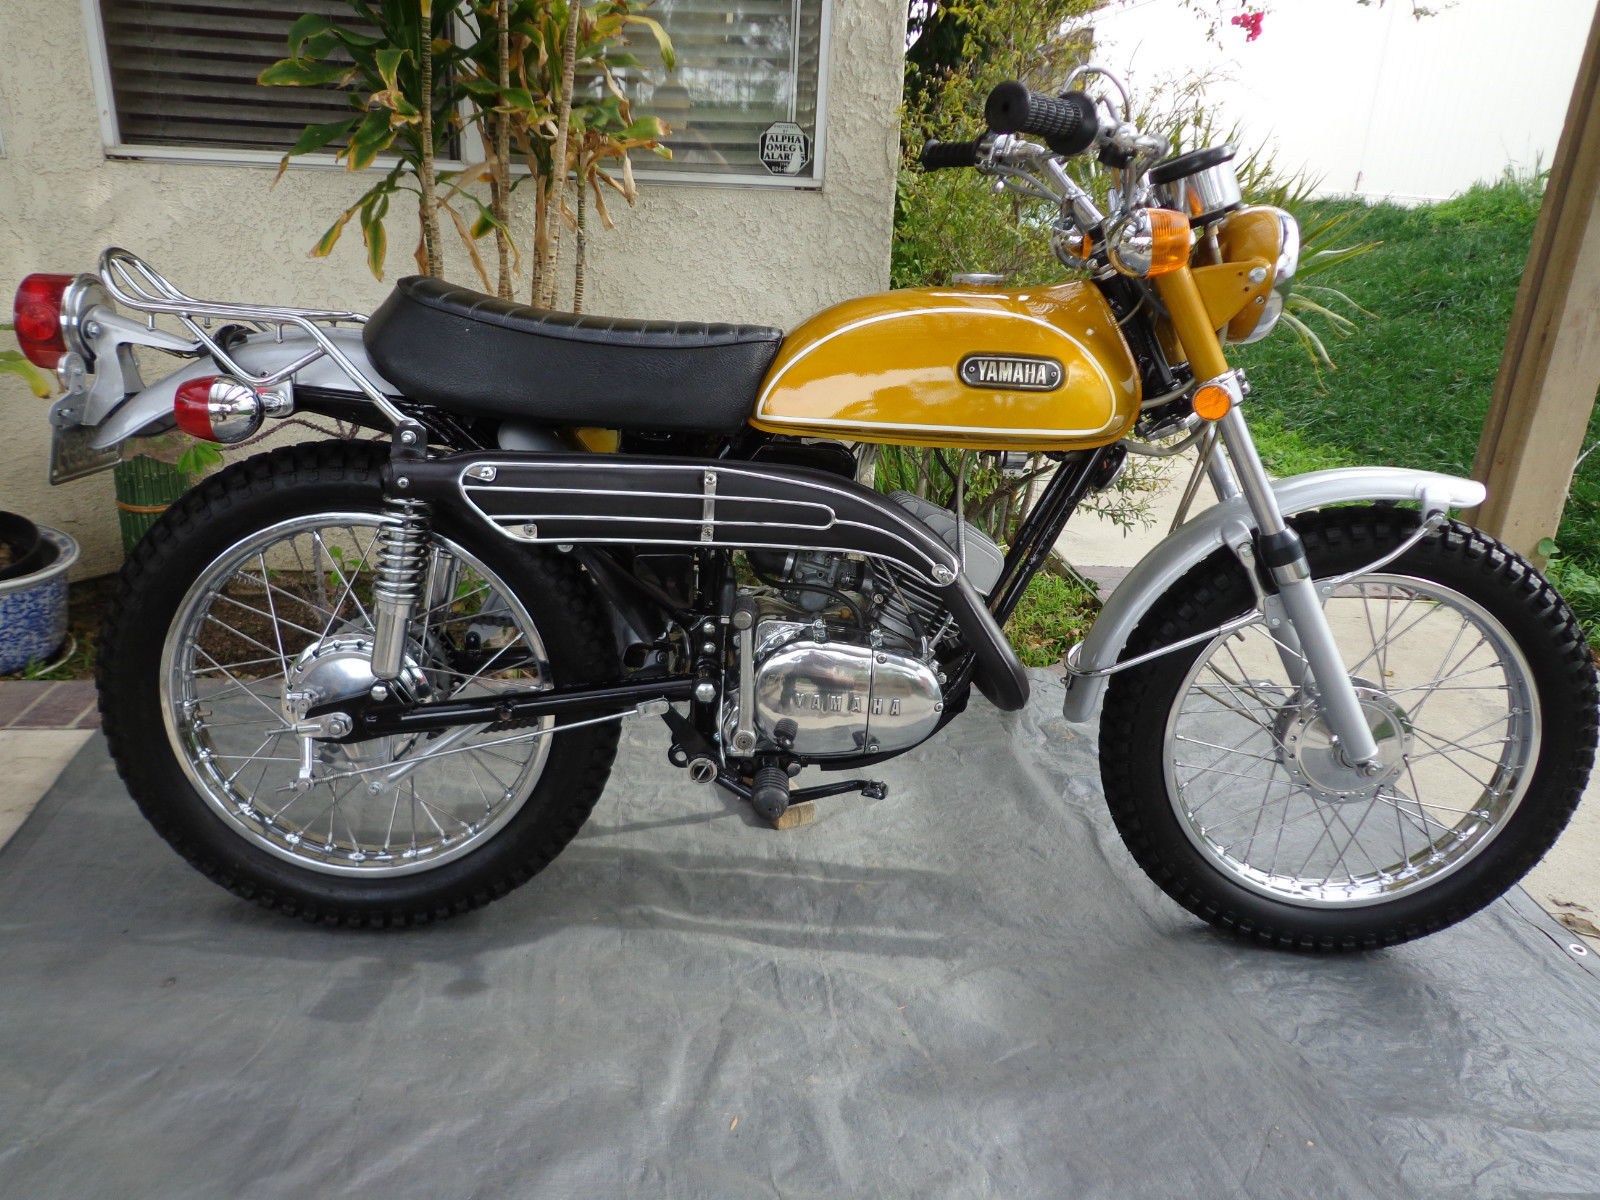 1971 Yamaha Ct1 Wiring Diagram Schematic Diagrams 1972 175 1973 Smart U2022 Cs5